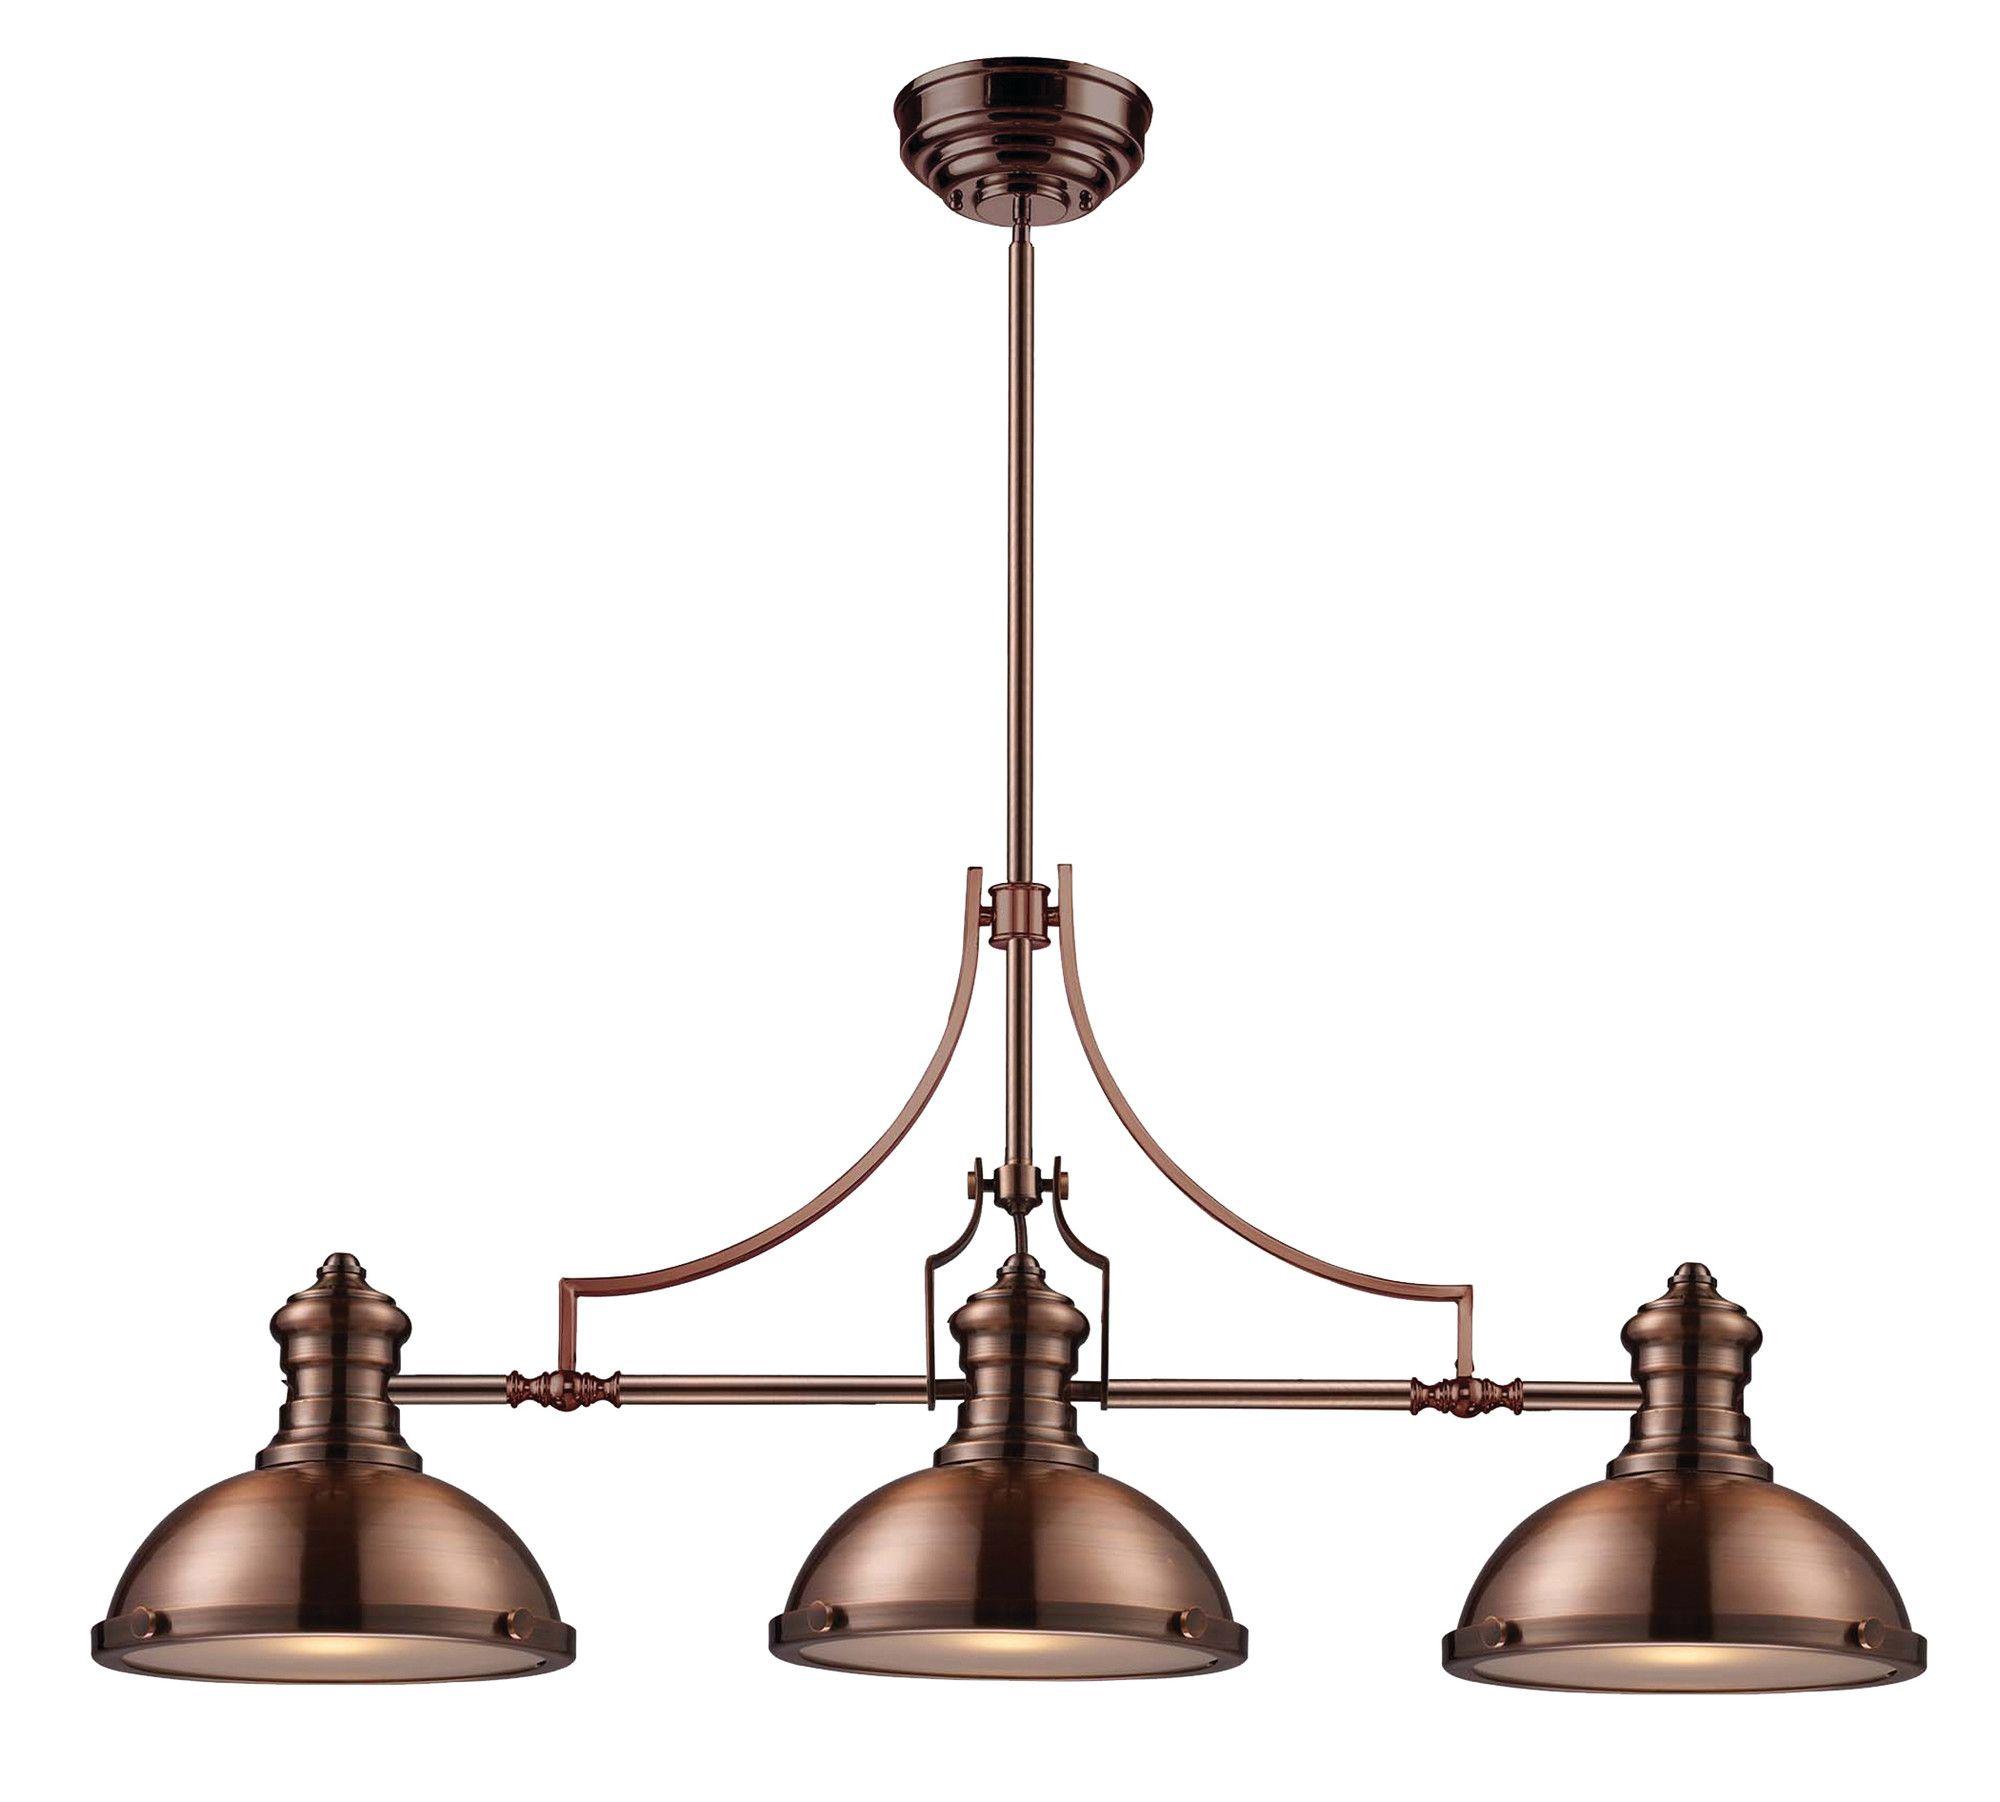 Fredela 3 Light Kitchen Island Linear Pendant Kitchen Island Pendants Copper Lighting Ceiling Lights